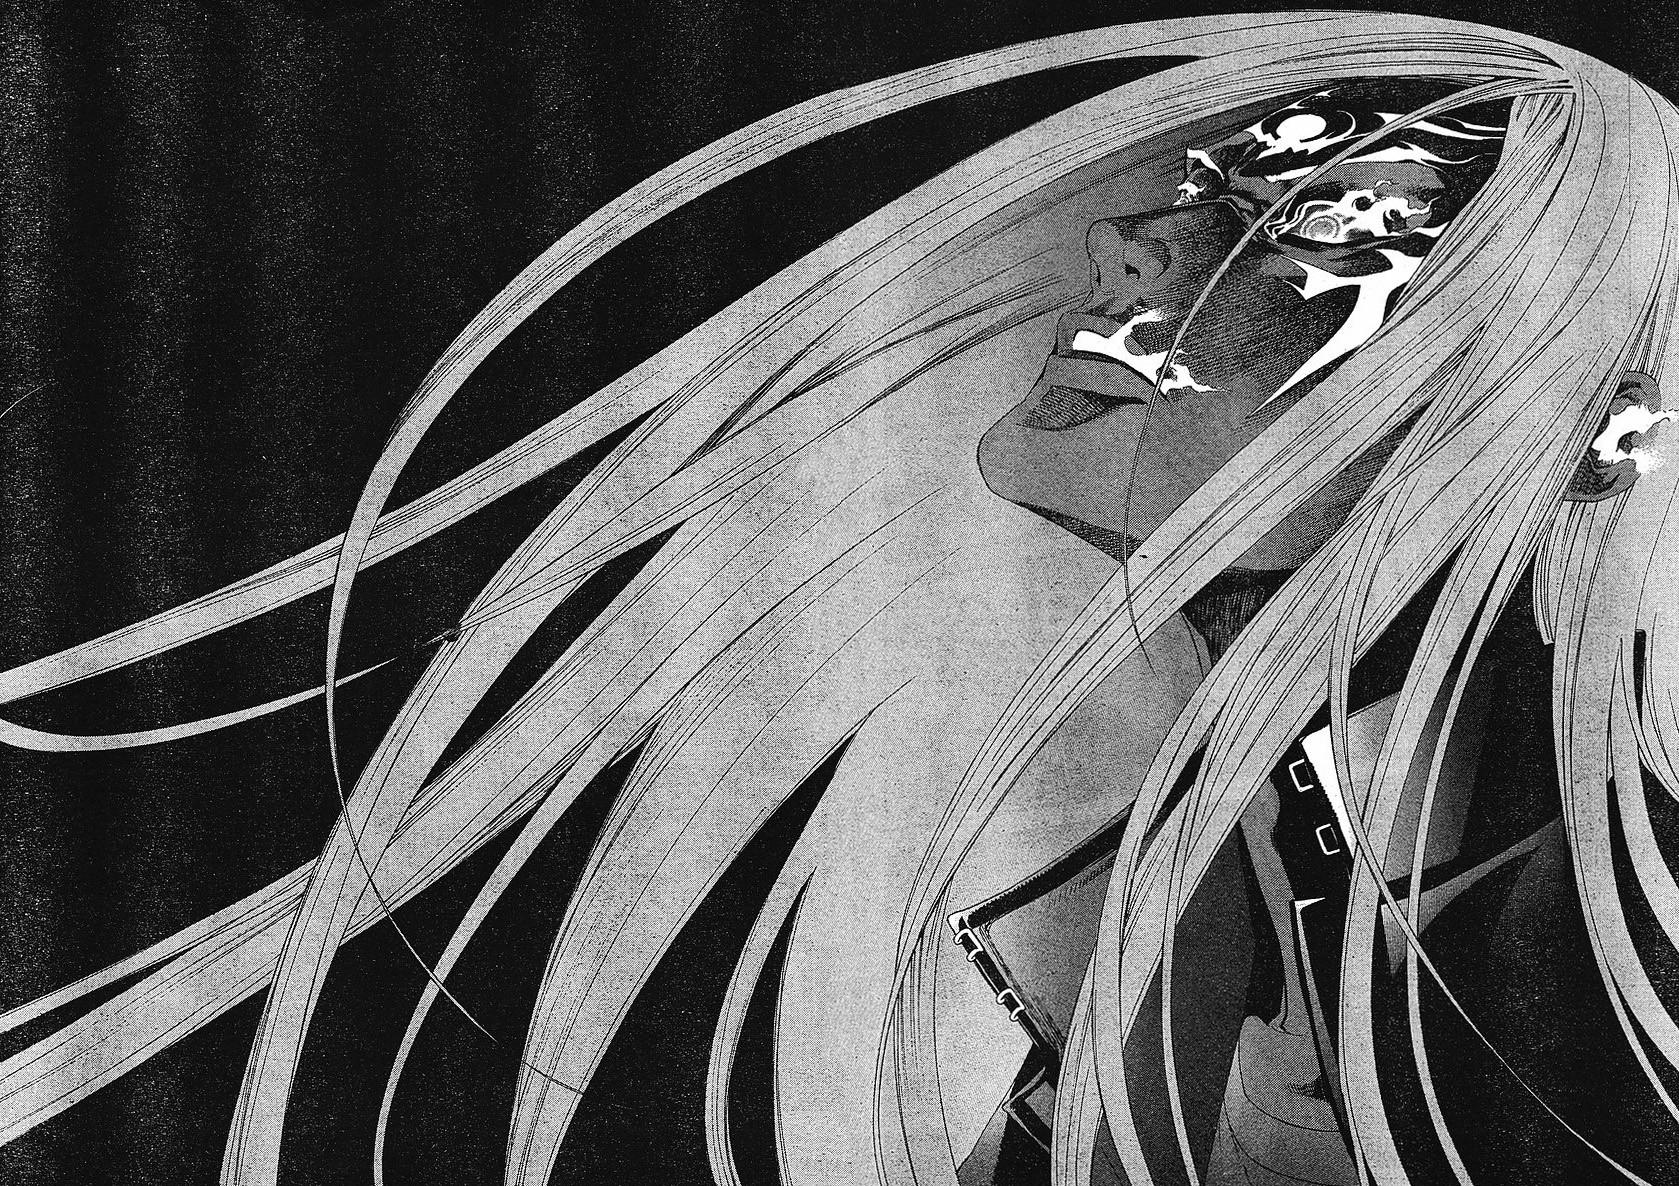 Nagi Souichiro - Tenjho Tenge - Zerochan Anime Image Board